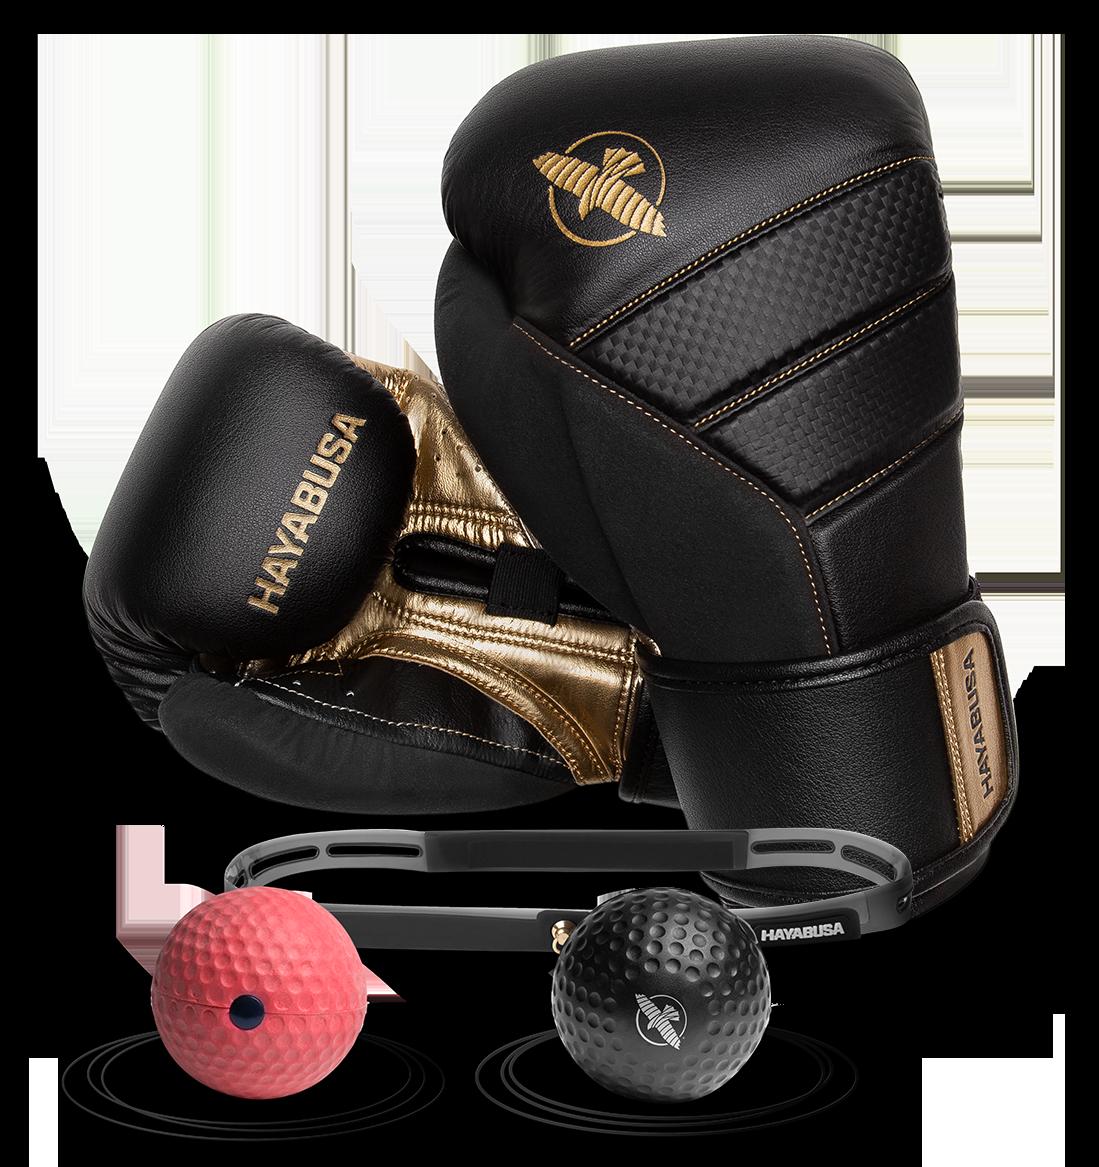 Hayabusa T3 Boxing Gloves, gold edition, with a reflex ball headband